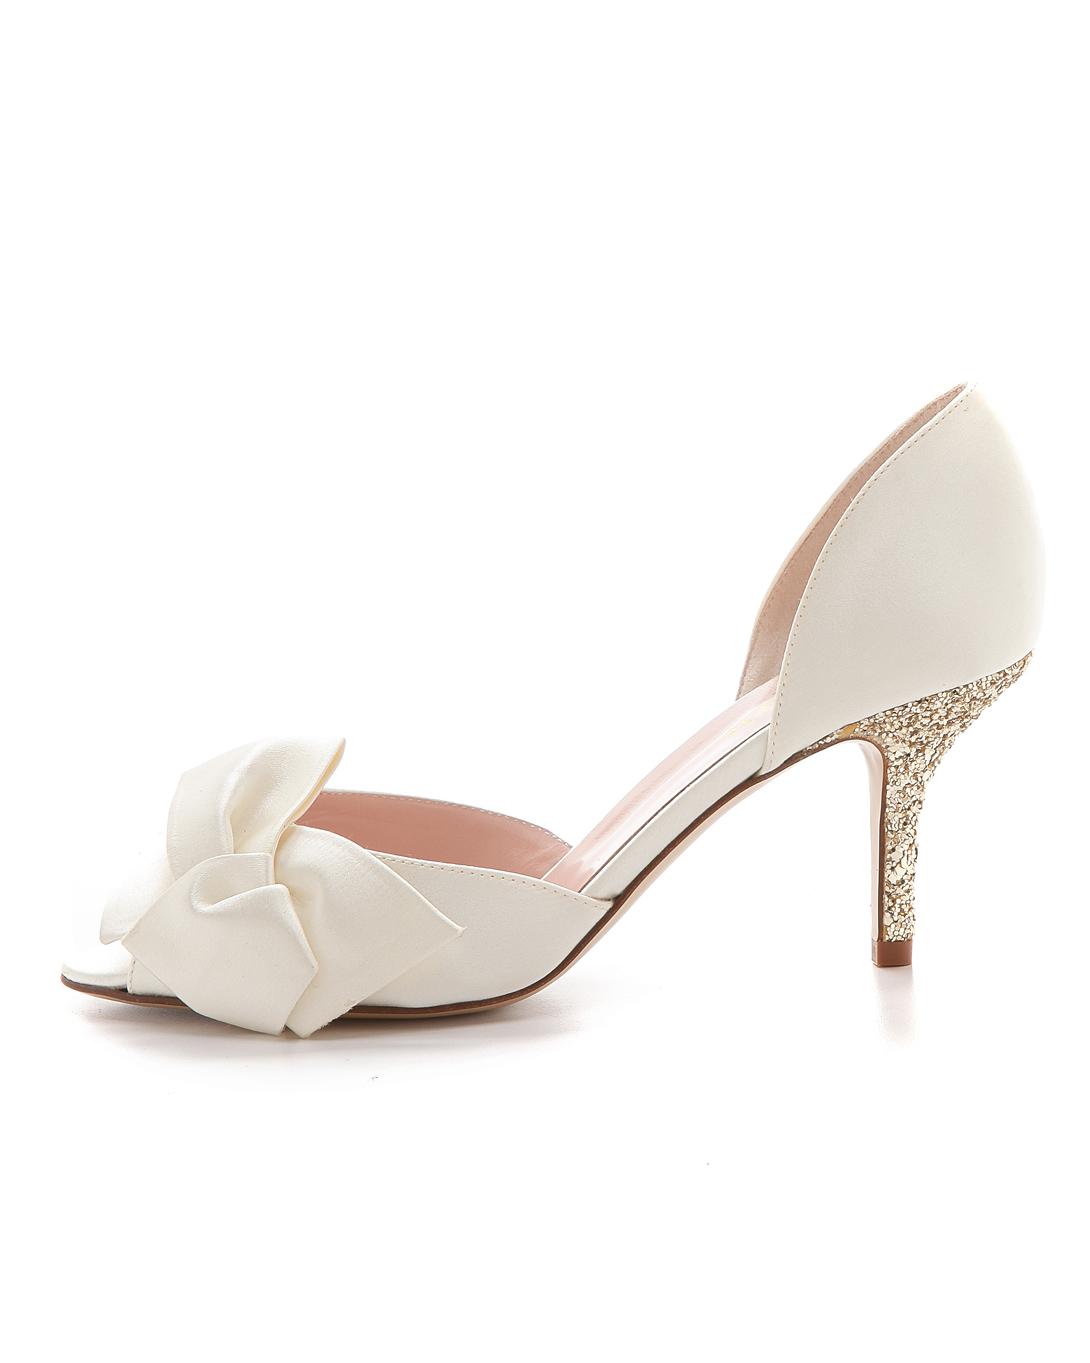 fall-wedding-shoes-kate-spade-sala-0914.jpg